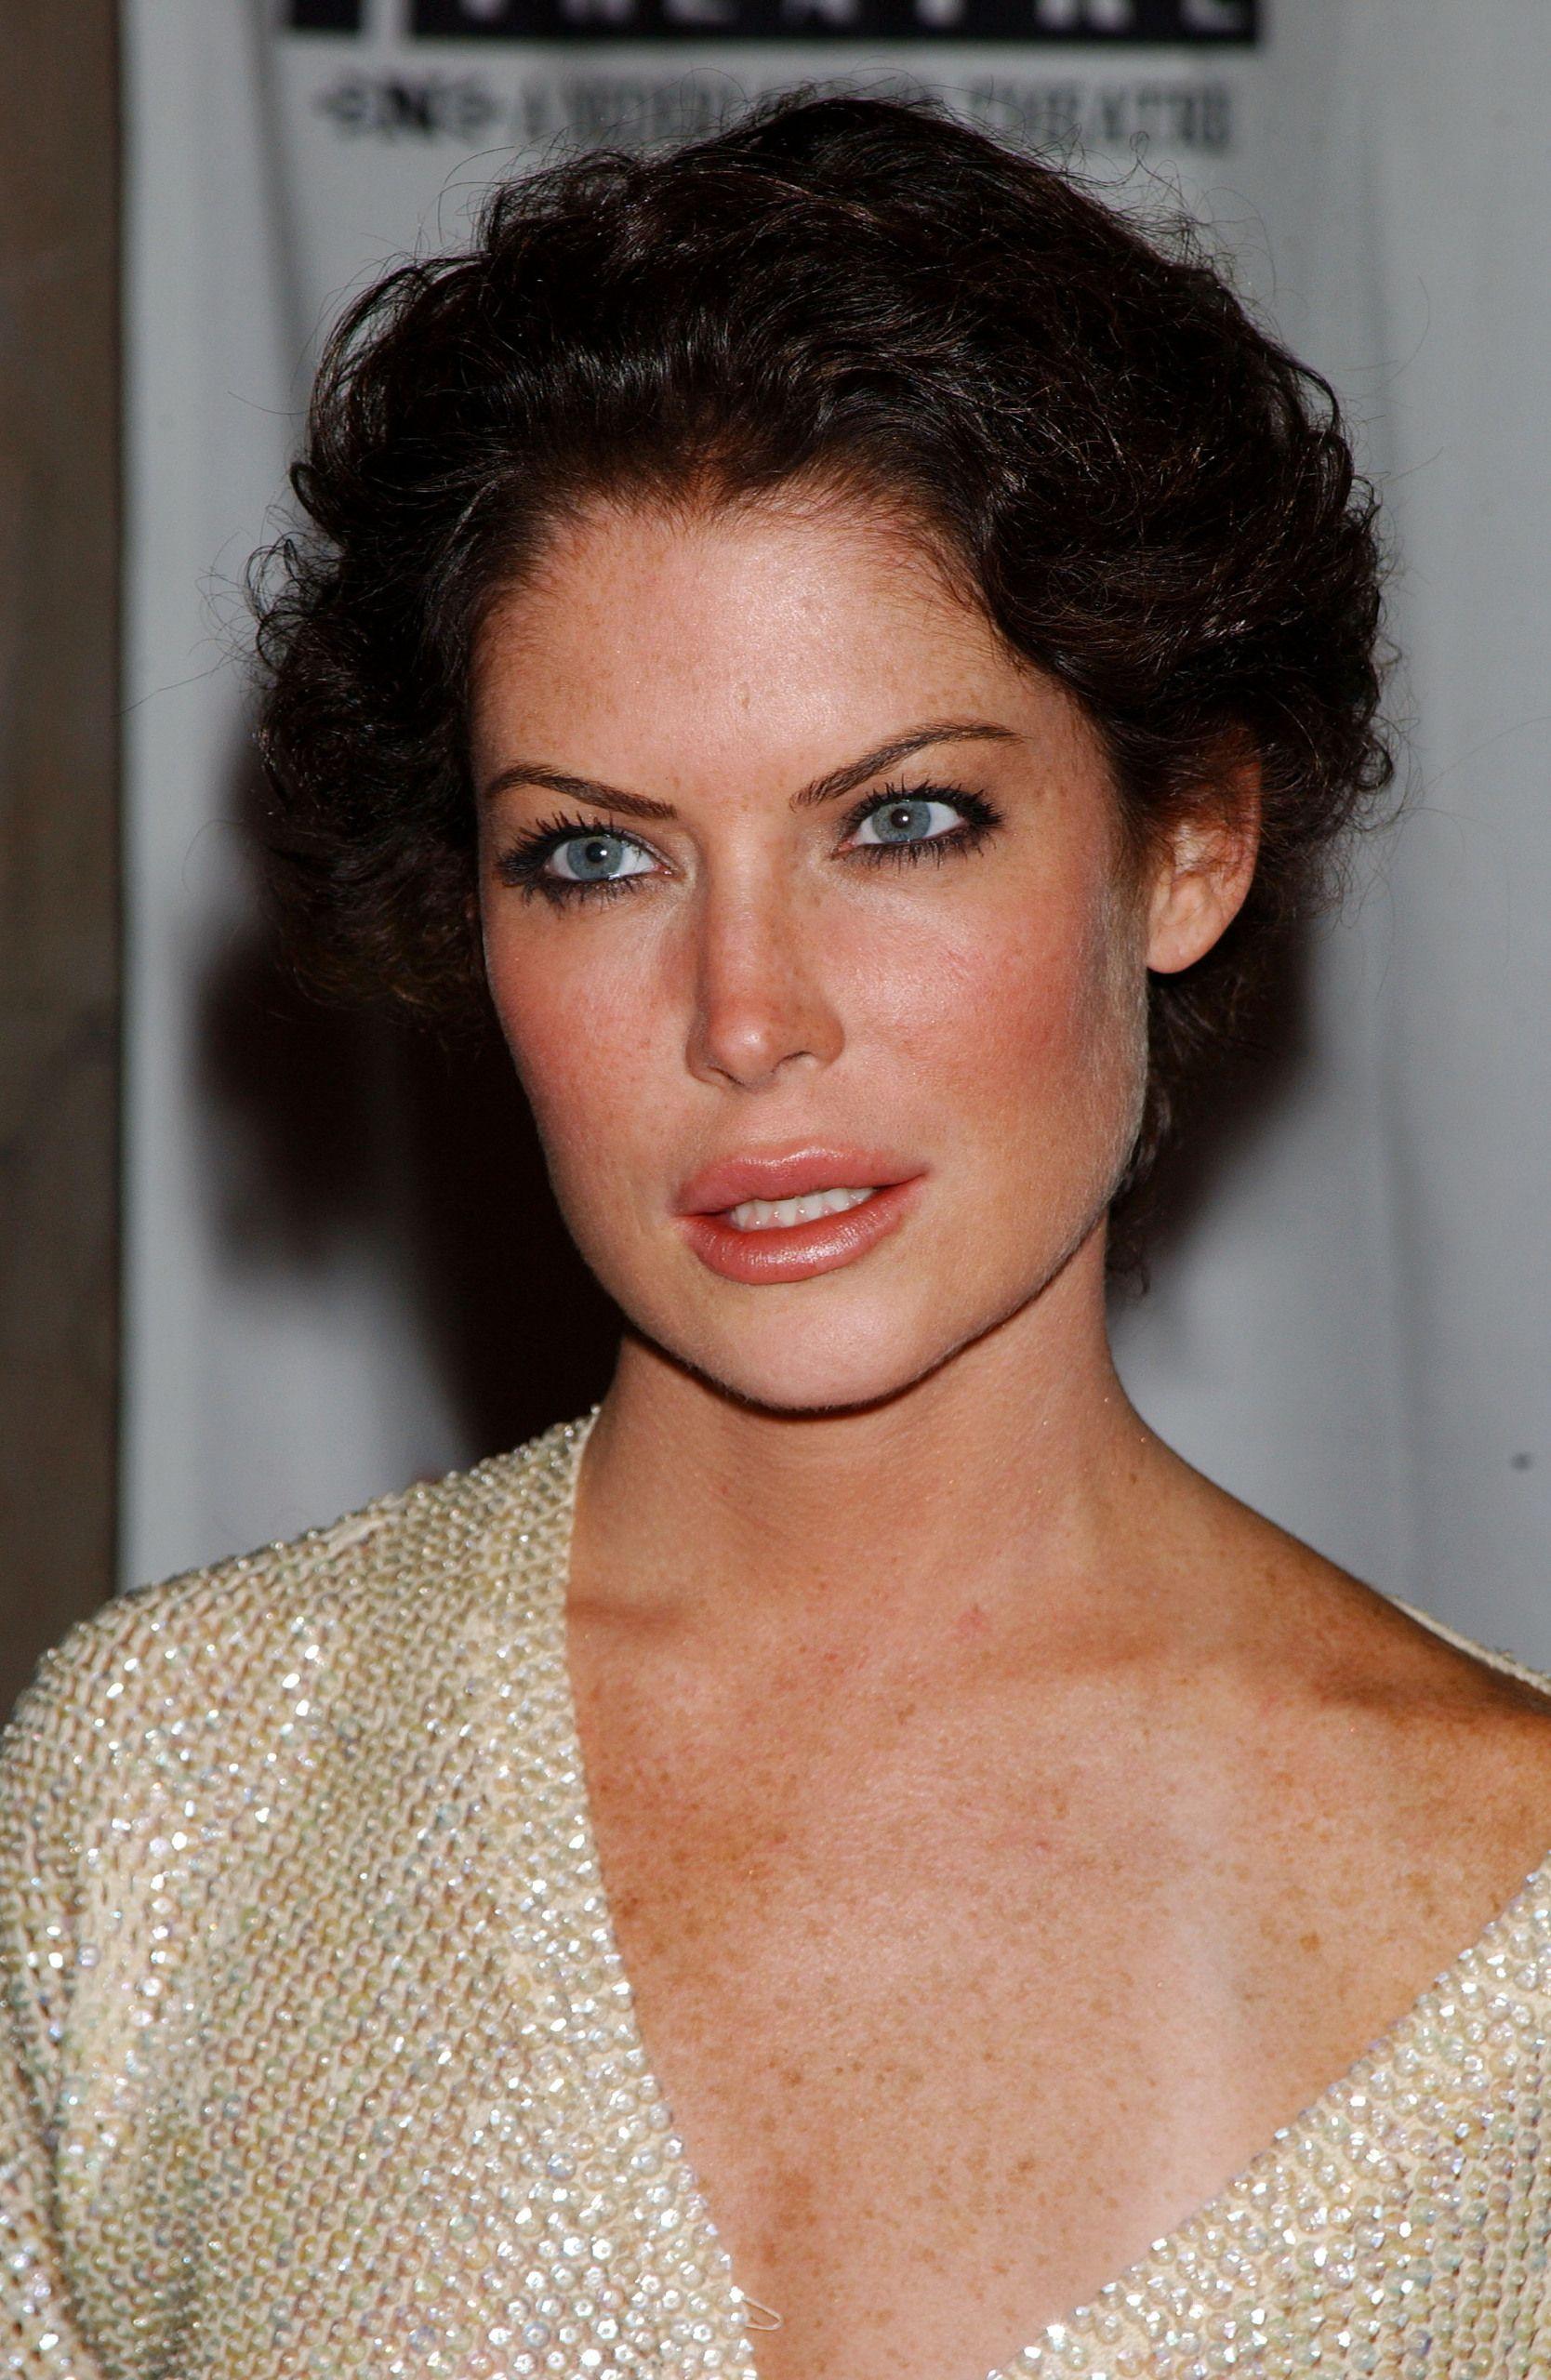 Lara flynn boyle naked fakes #7